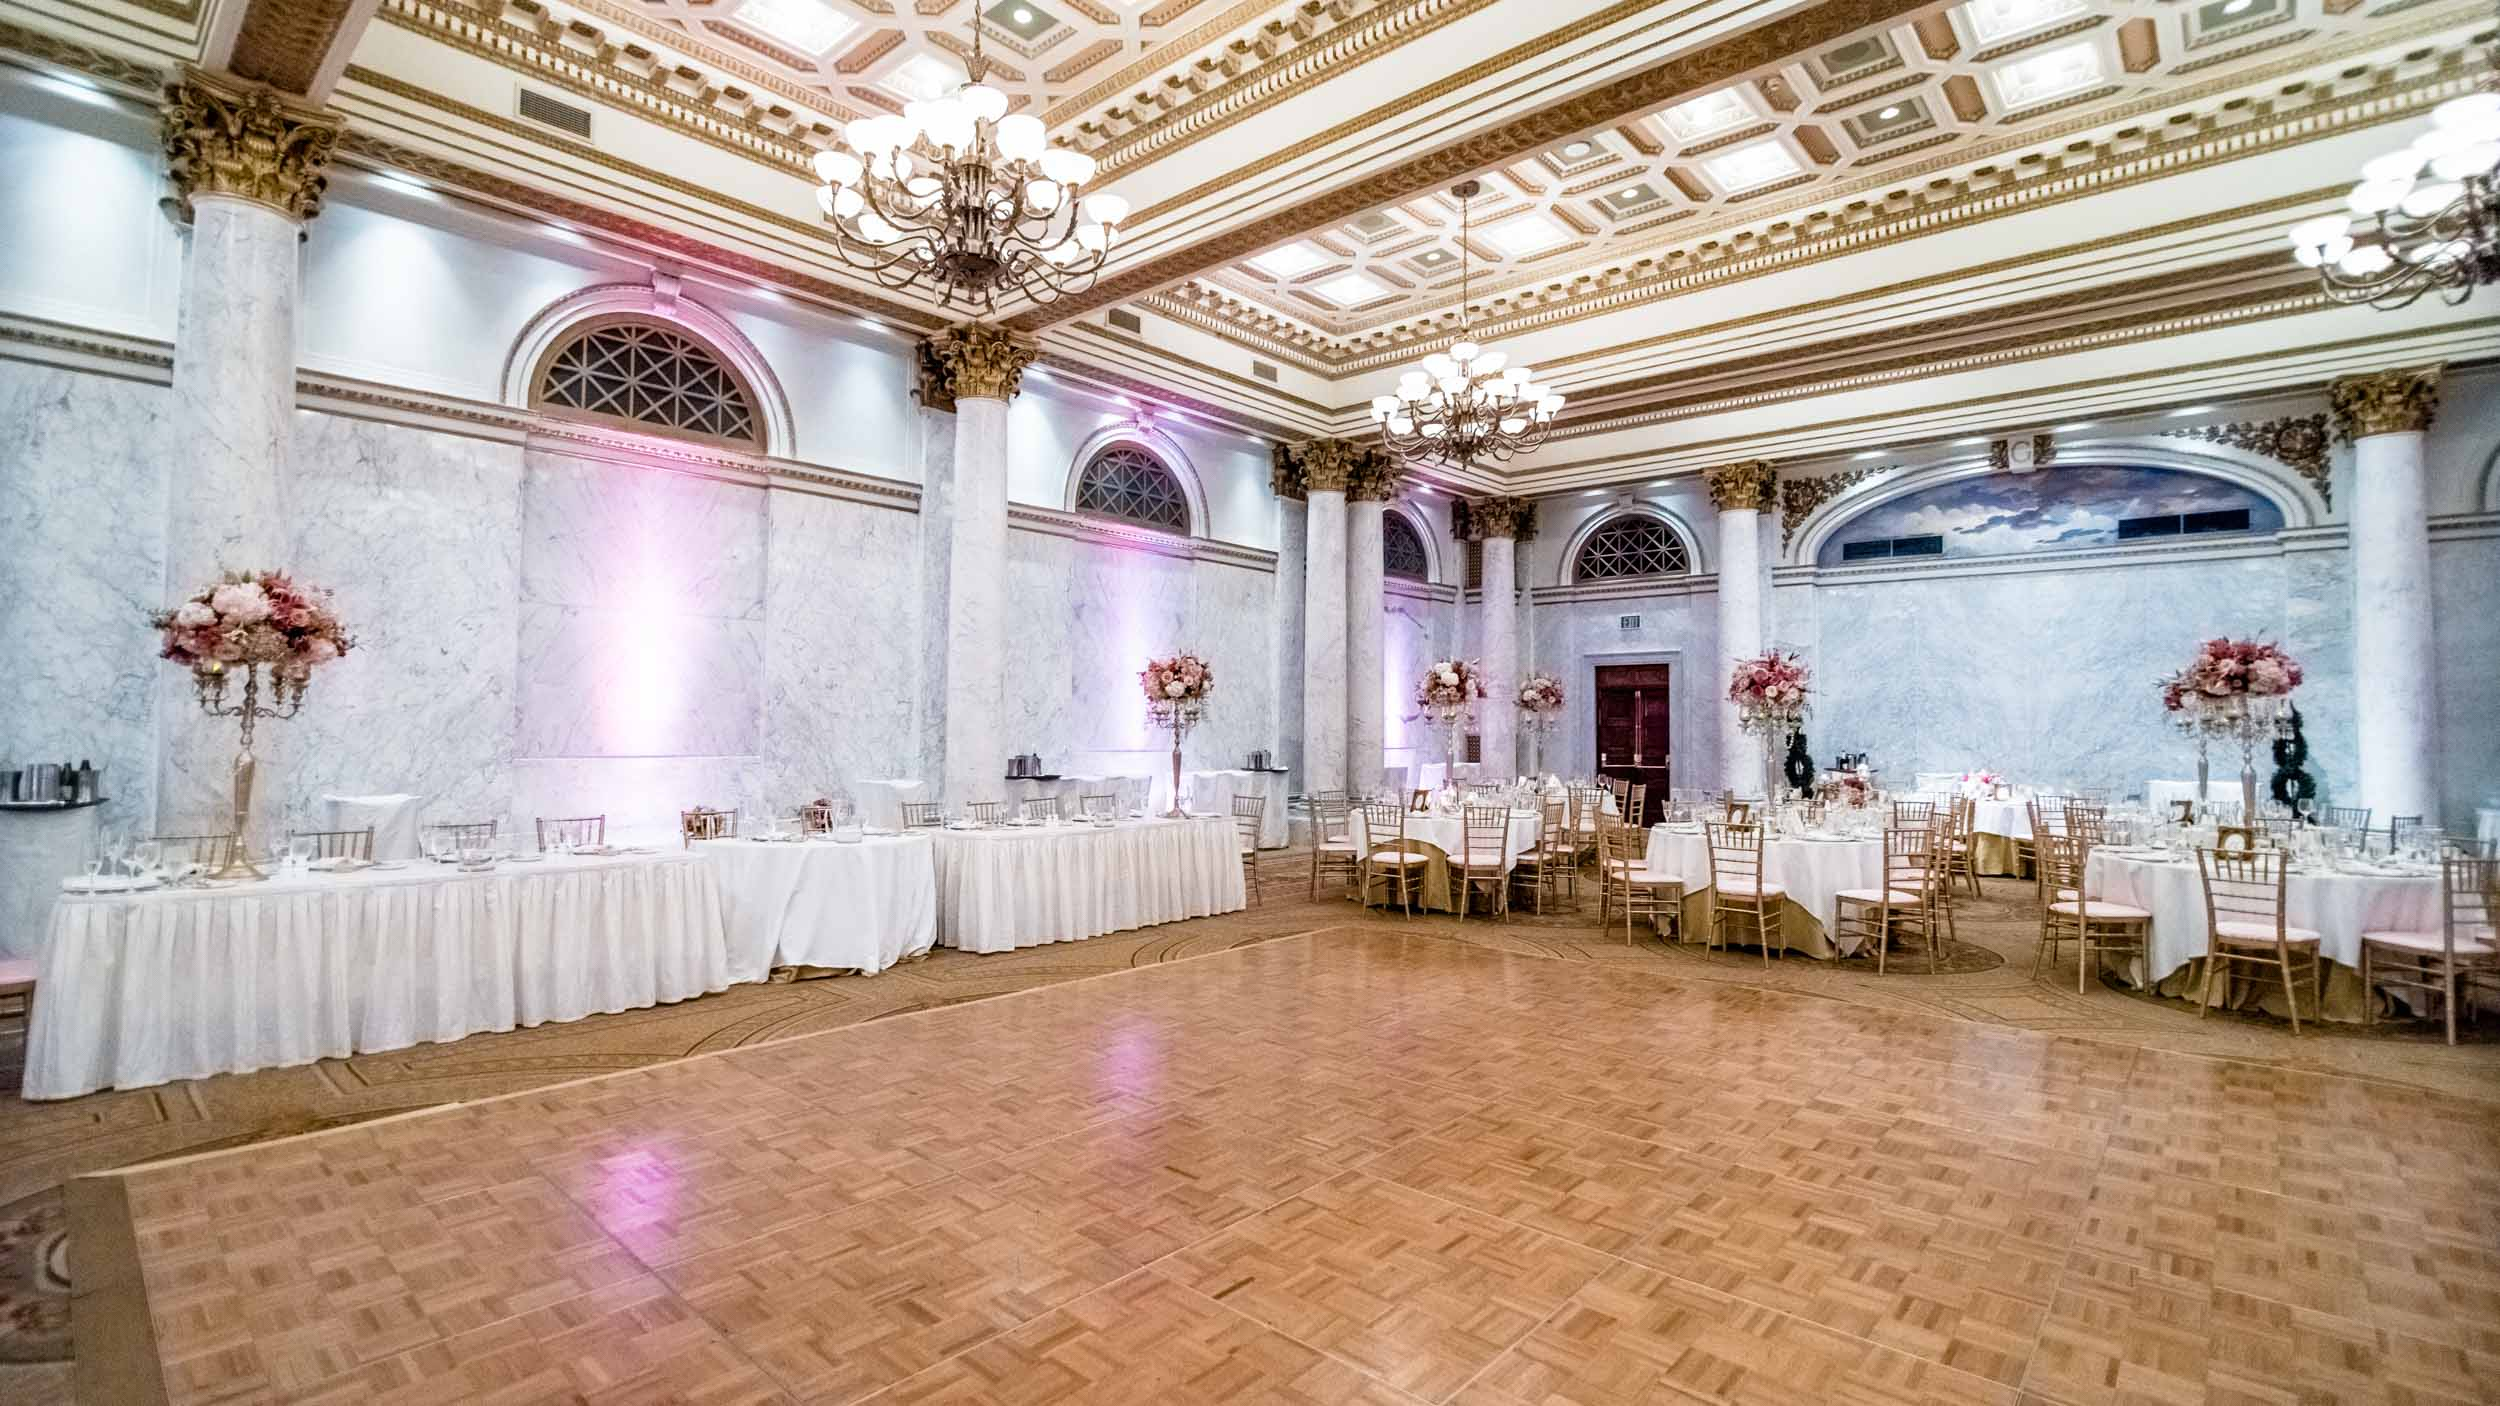 dc+metro+wedding+photographer+vadym+guliuk+photography+wedding+venue-2025.jpg